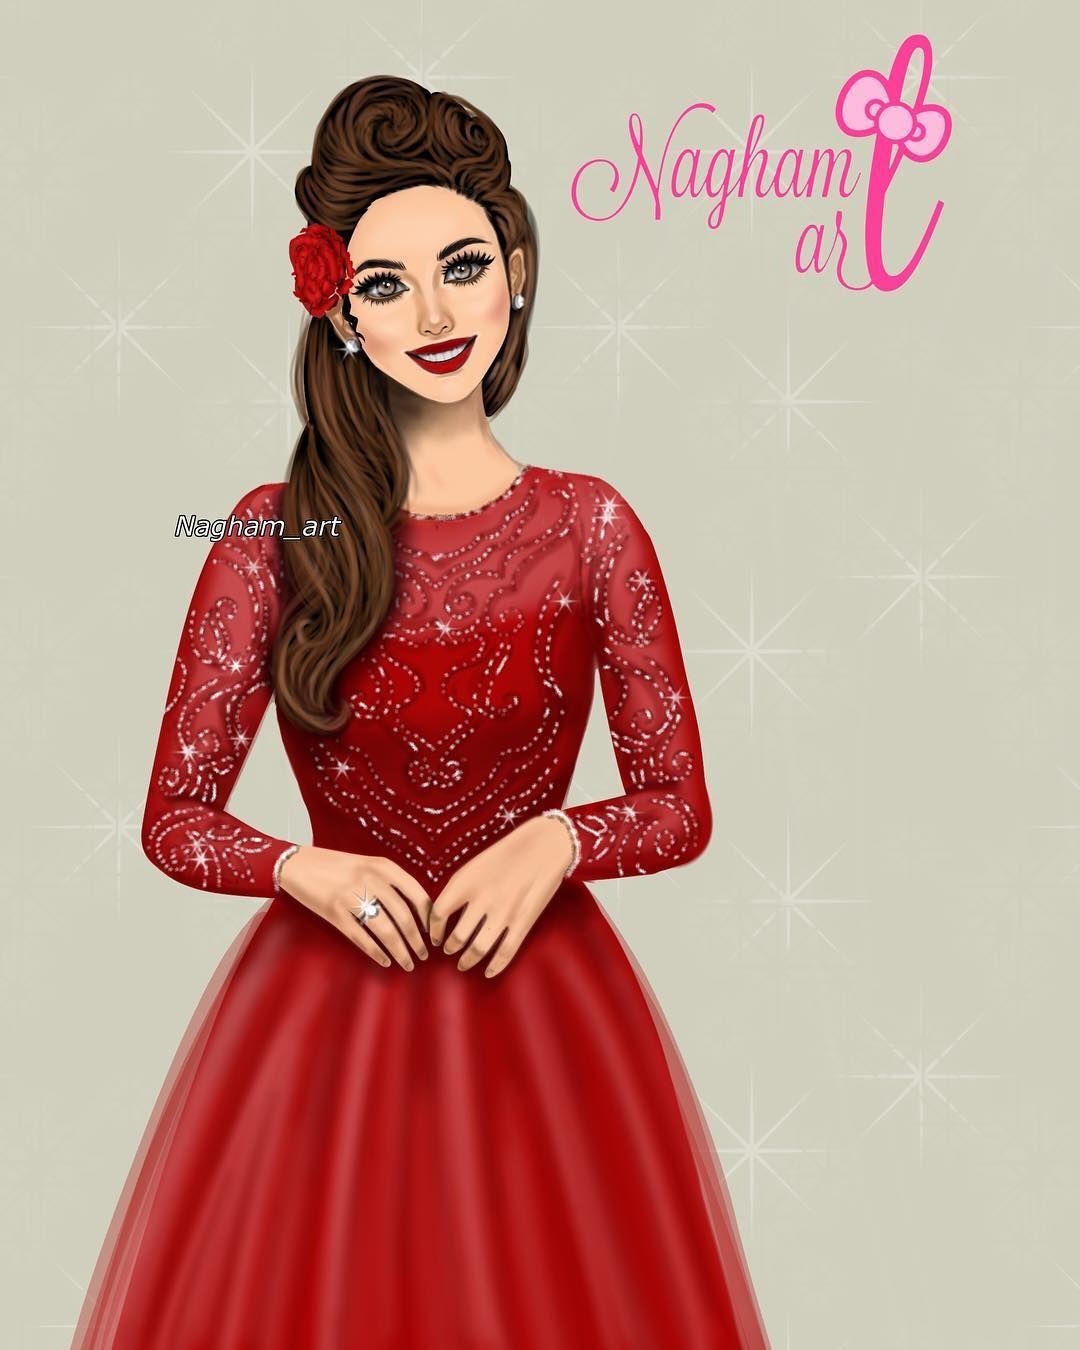 خلفيات بنات كرتونيه رمزيات كرتون للبنات Lovely Girl Image Dress Sketches Beautiful Girl Drawing